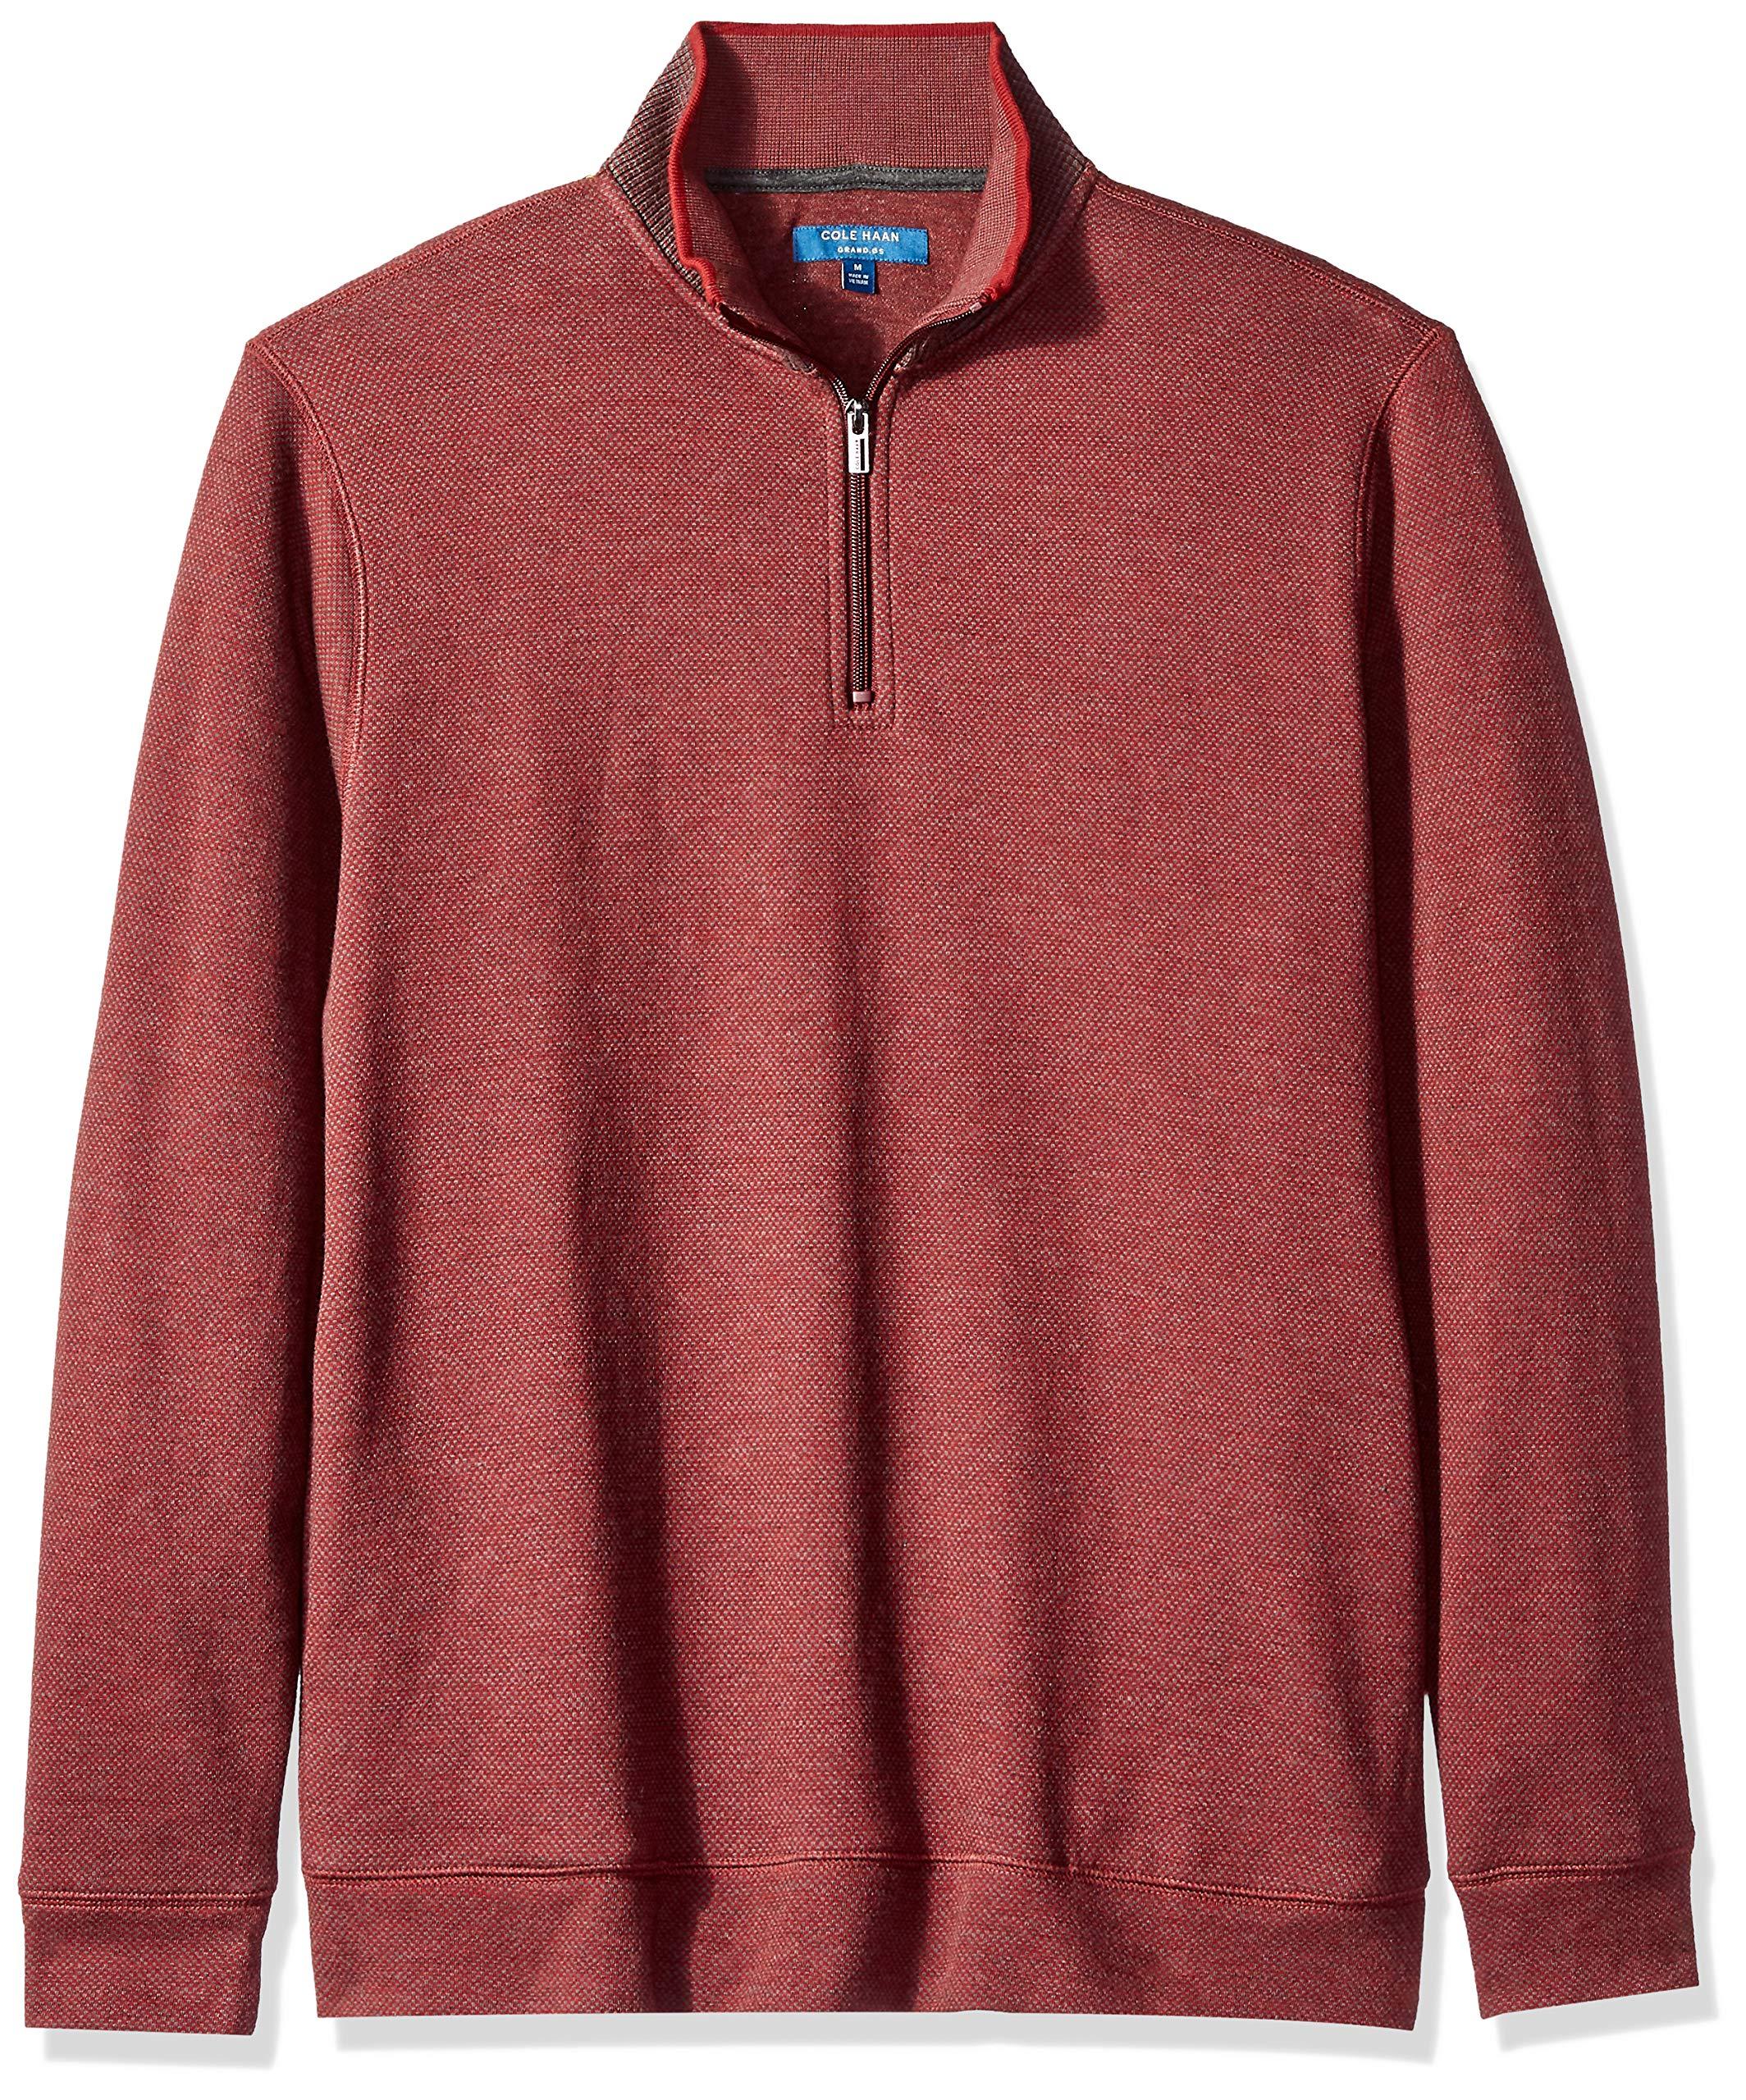 Cole Haan Men's Birdseye 1/4 Zip Knit Sweater, Syrah, M